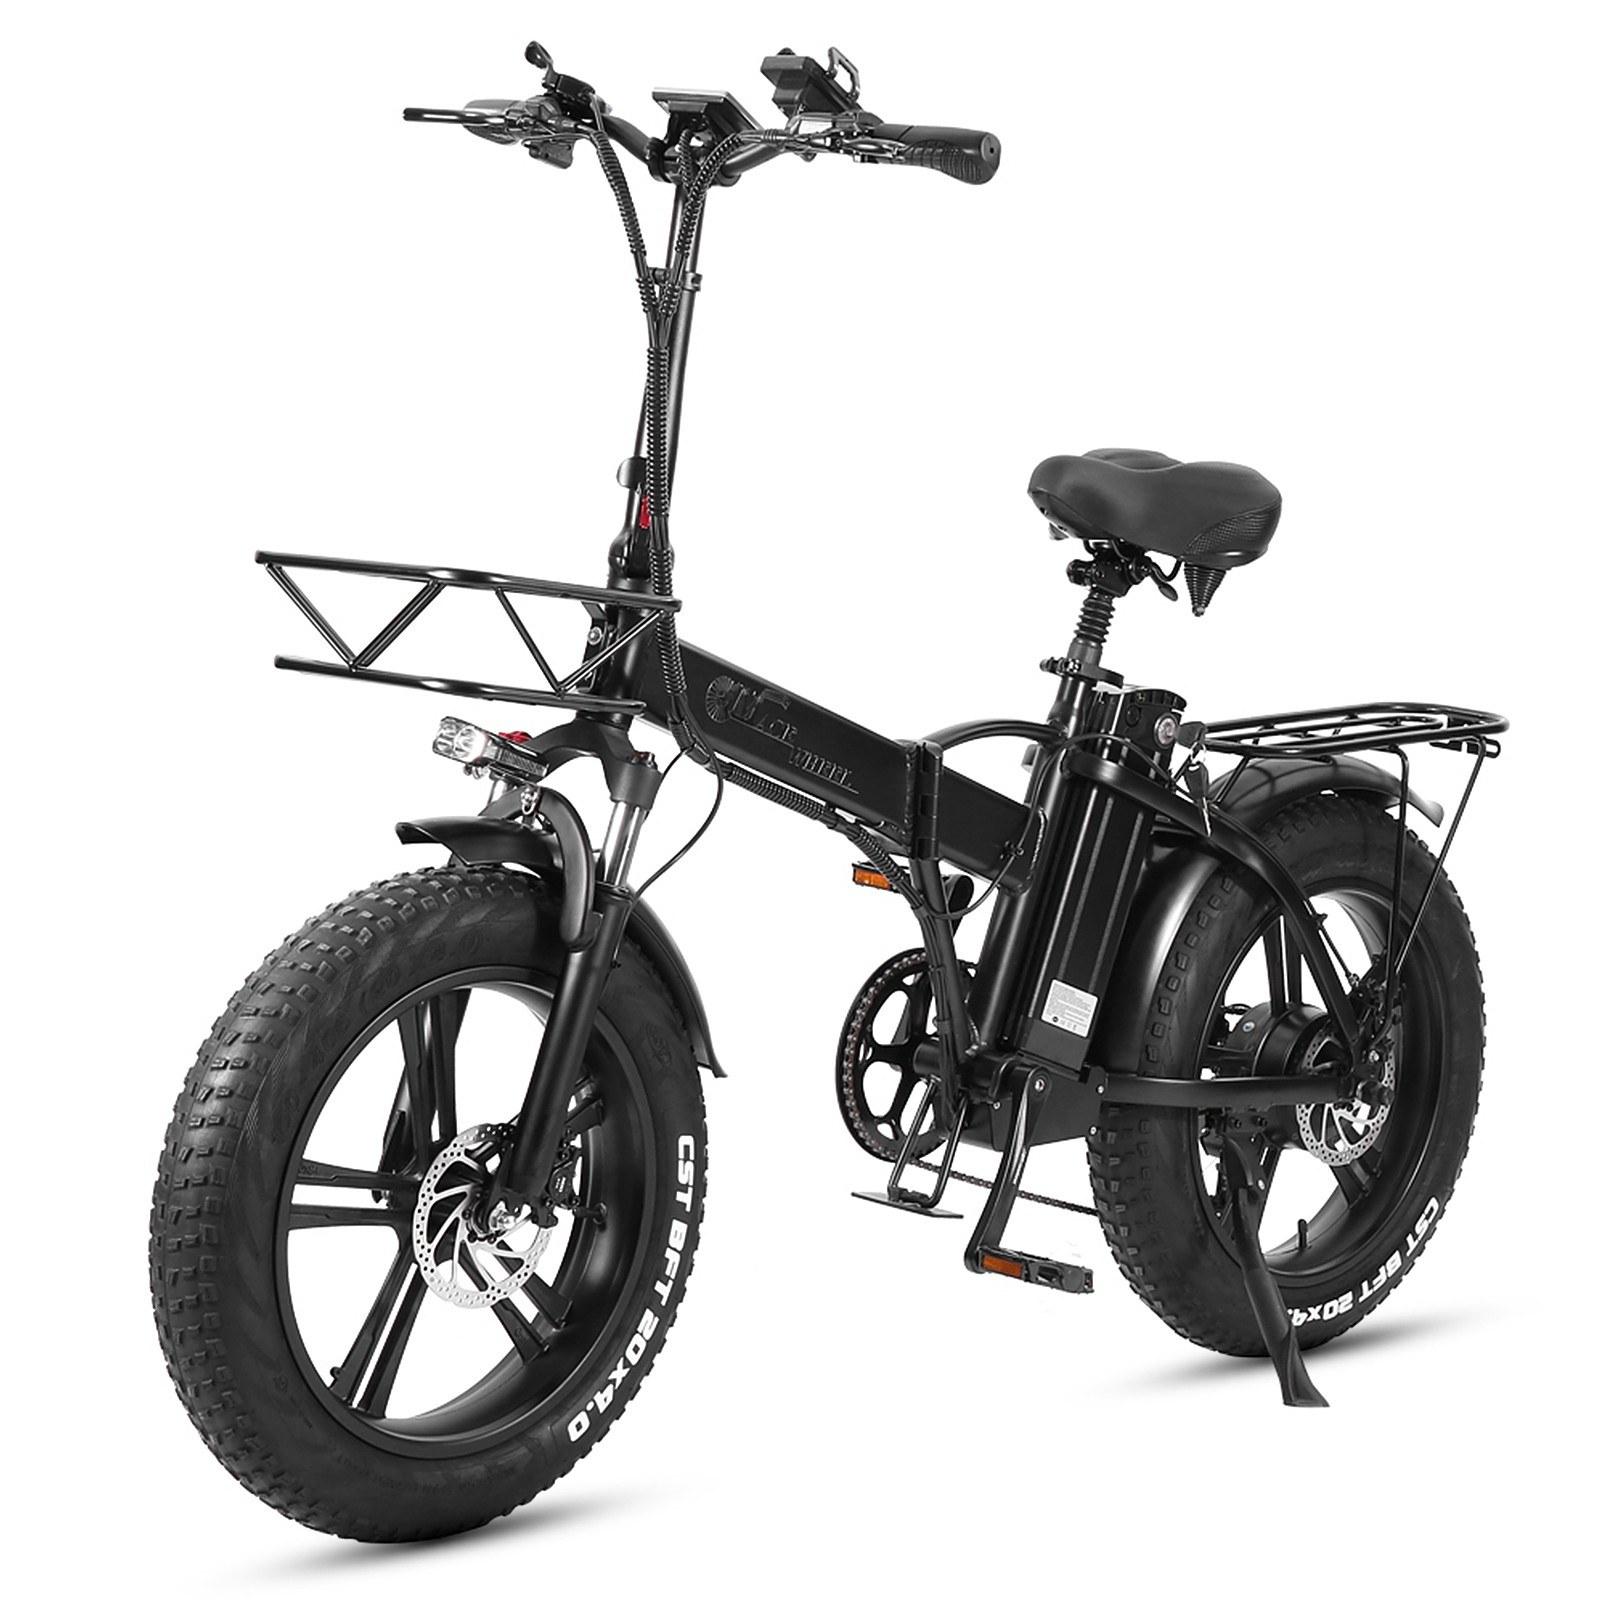 tomtop.com - [EU Warehouse] $496.78 OFF CMACEWHEEL GW20 20Inch Folding Electric Bike 48V 15AH 750W, $1188.22 (Inclusive of VAT)